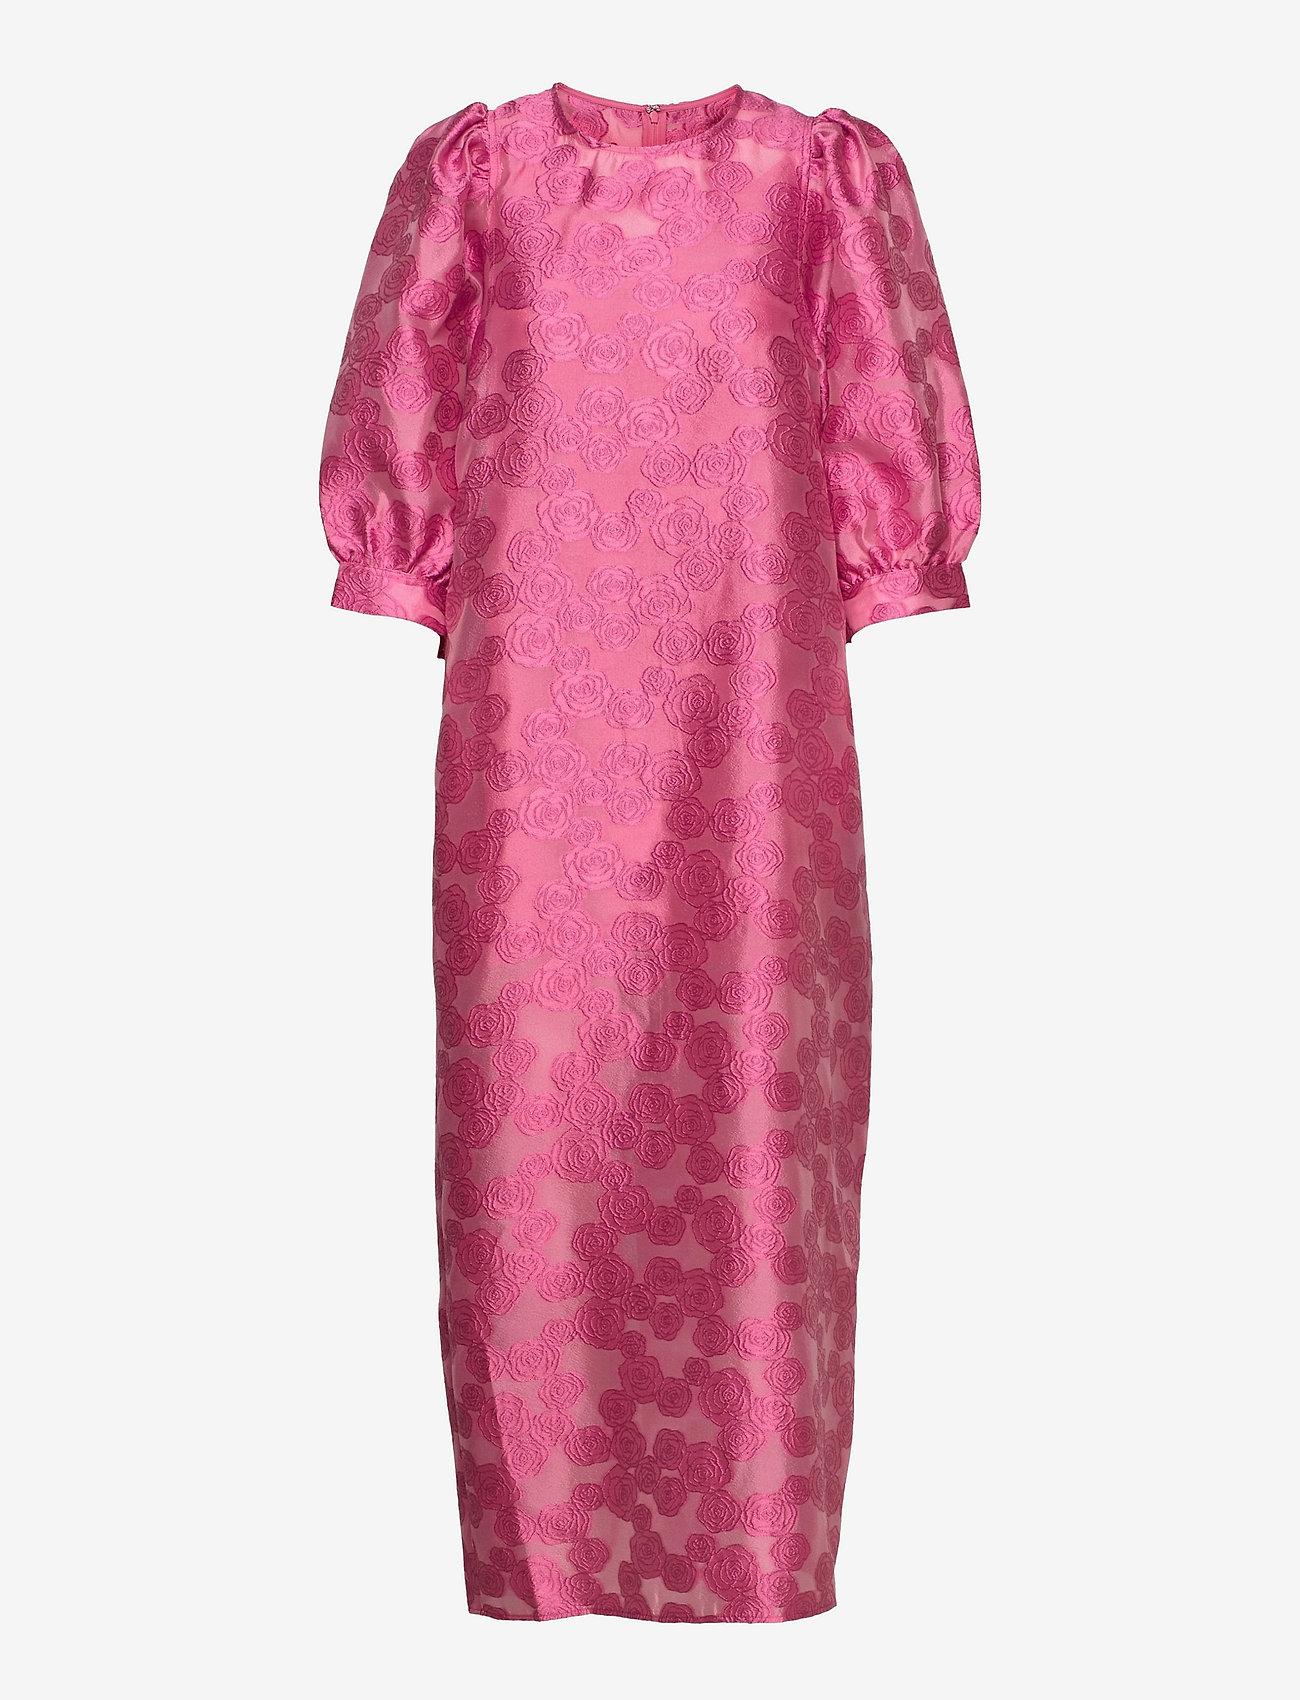 Samsøe Samsøe - Celestina long dress 12939 - kveldskjoler - bubble gum pink - 1